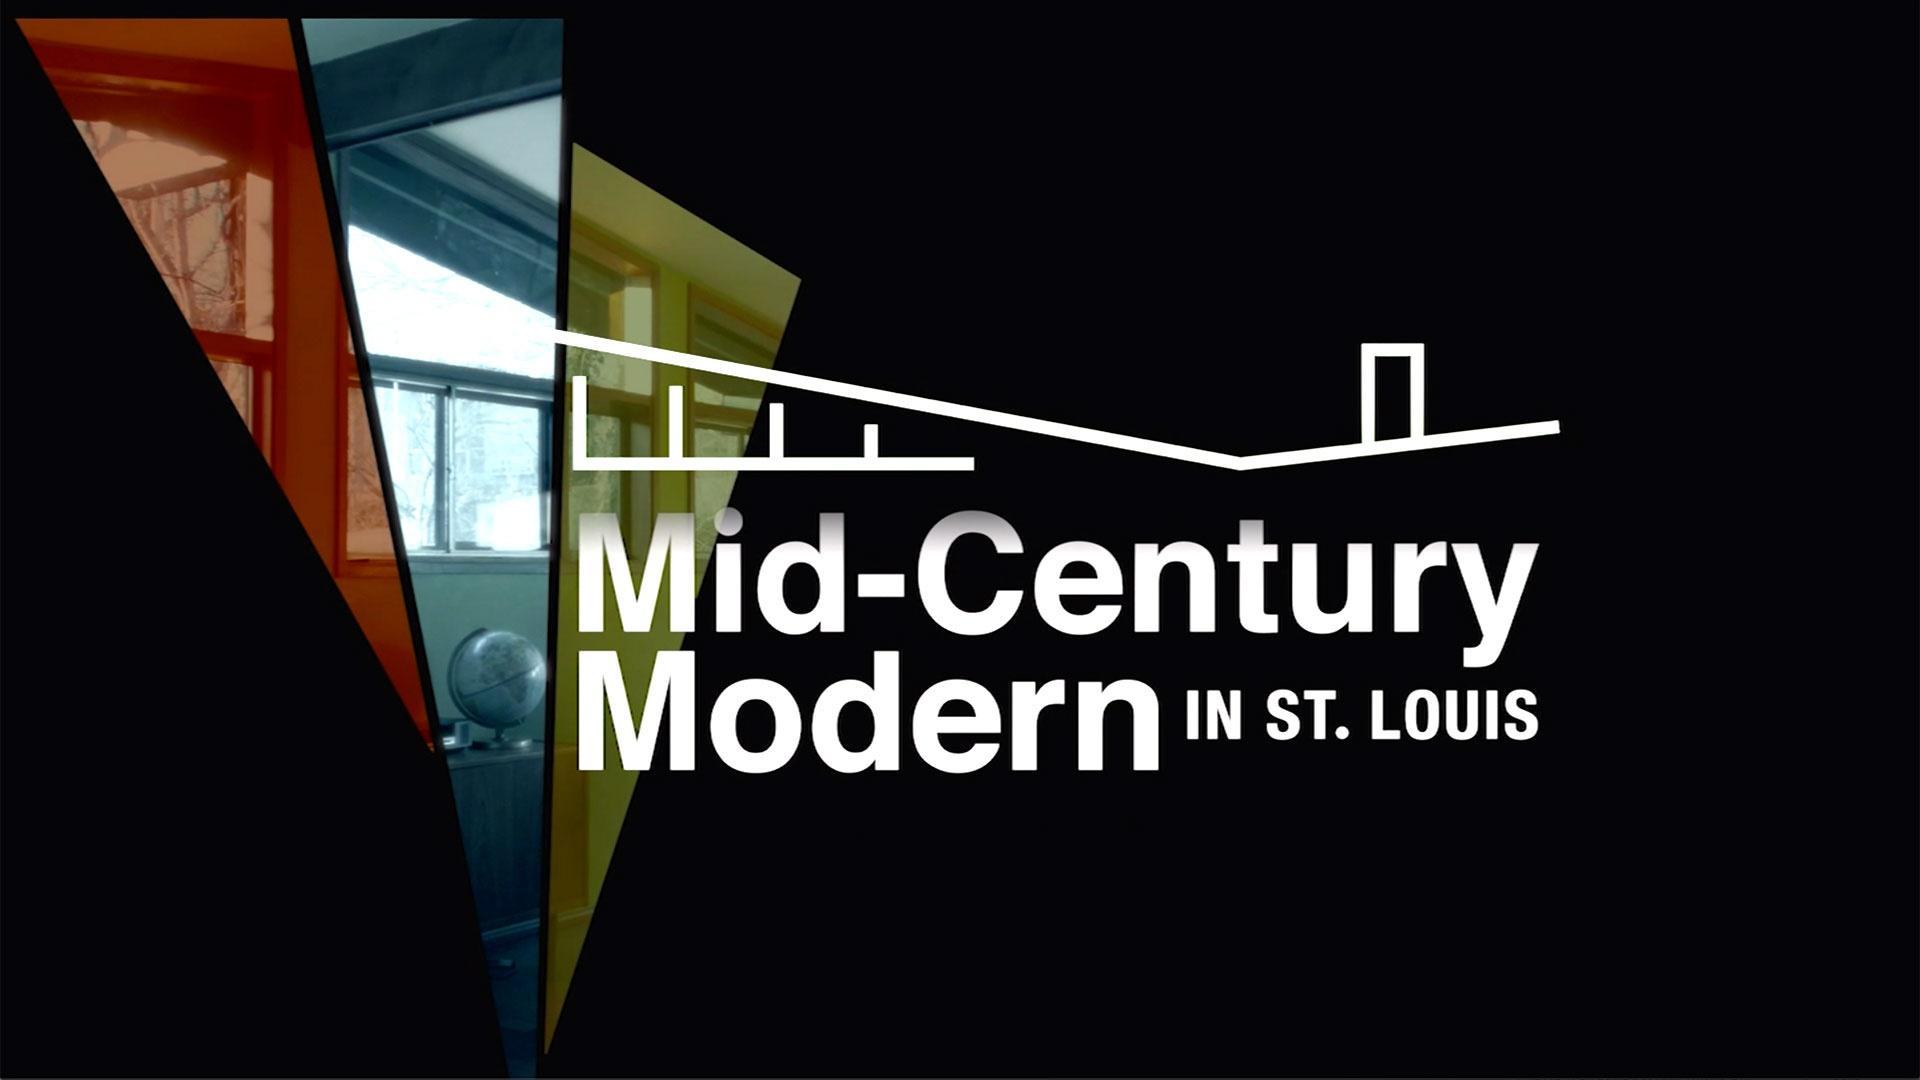 Mid-Century Modern in St. Louis